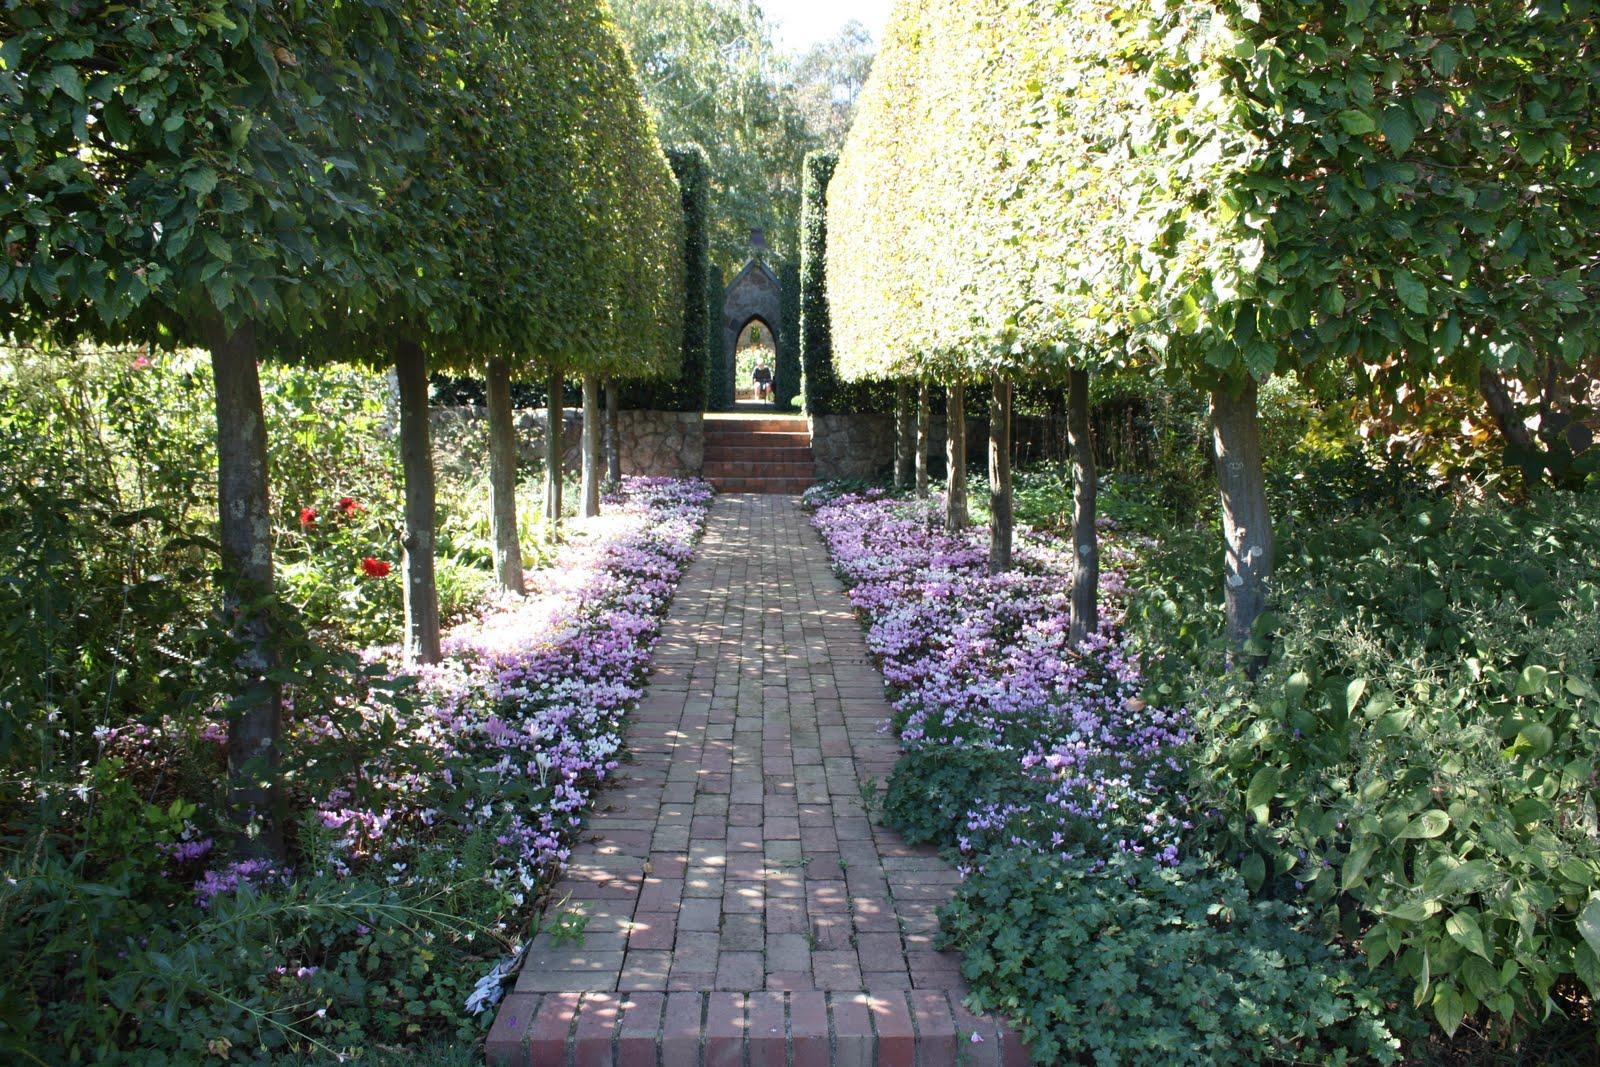 Eden Design A Visit To Sunnymead Inspirational Garden